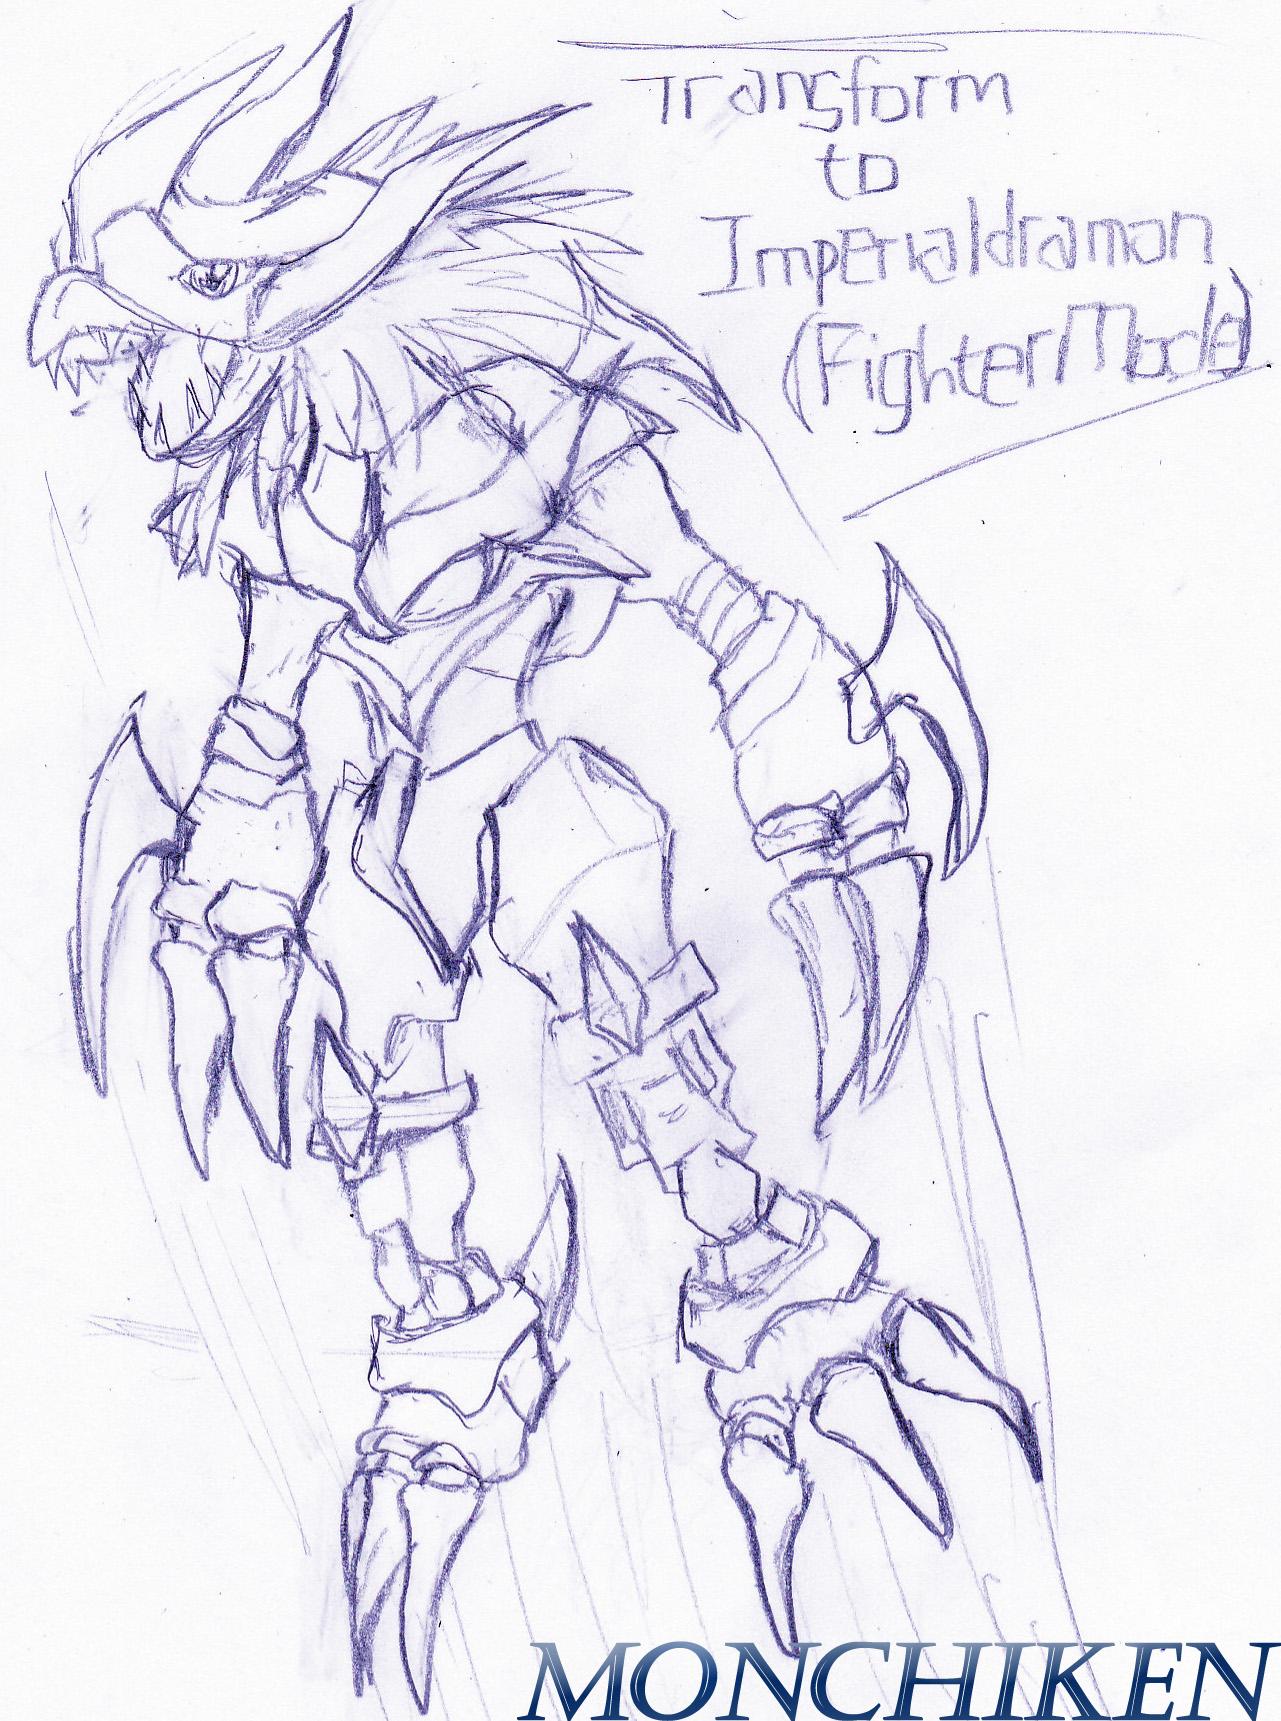 10 TF Imperialdramon-Fighter by monchiken on DeviantArt